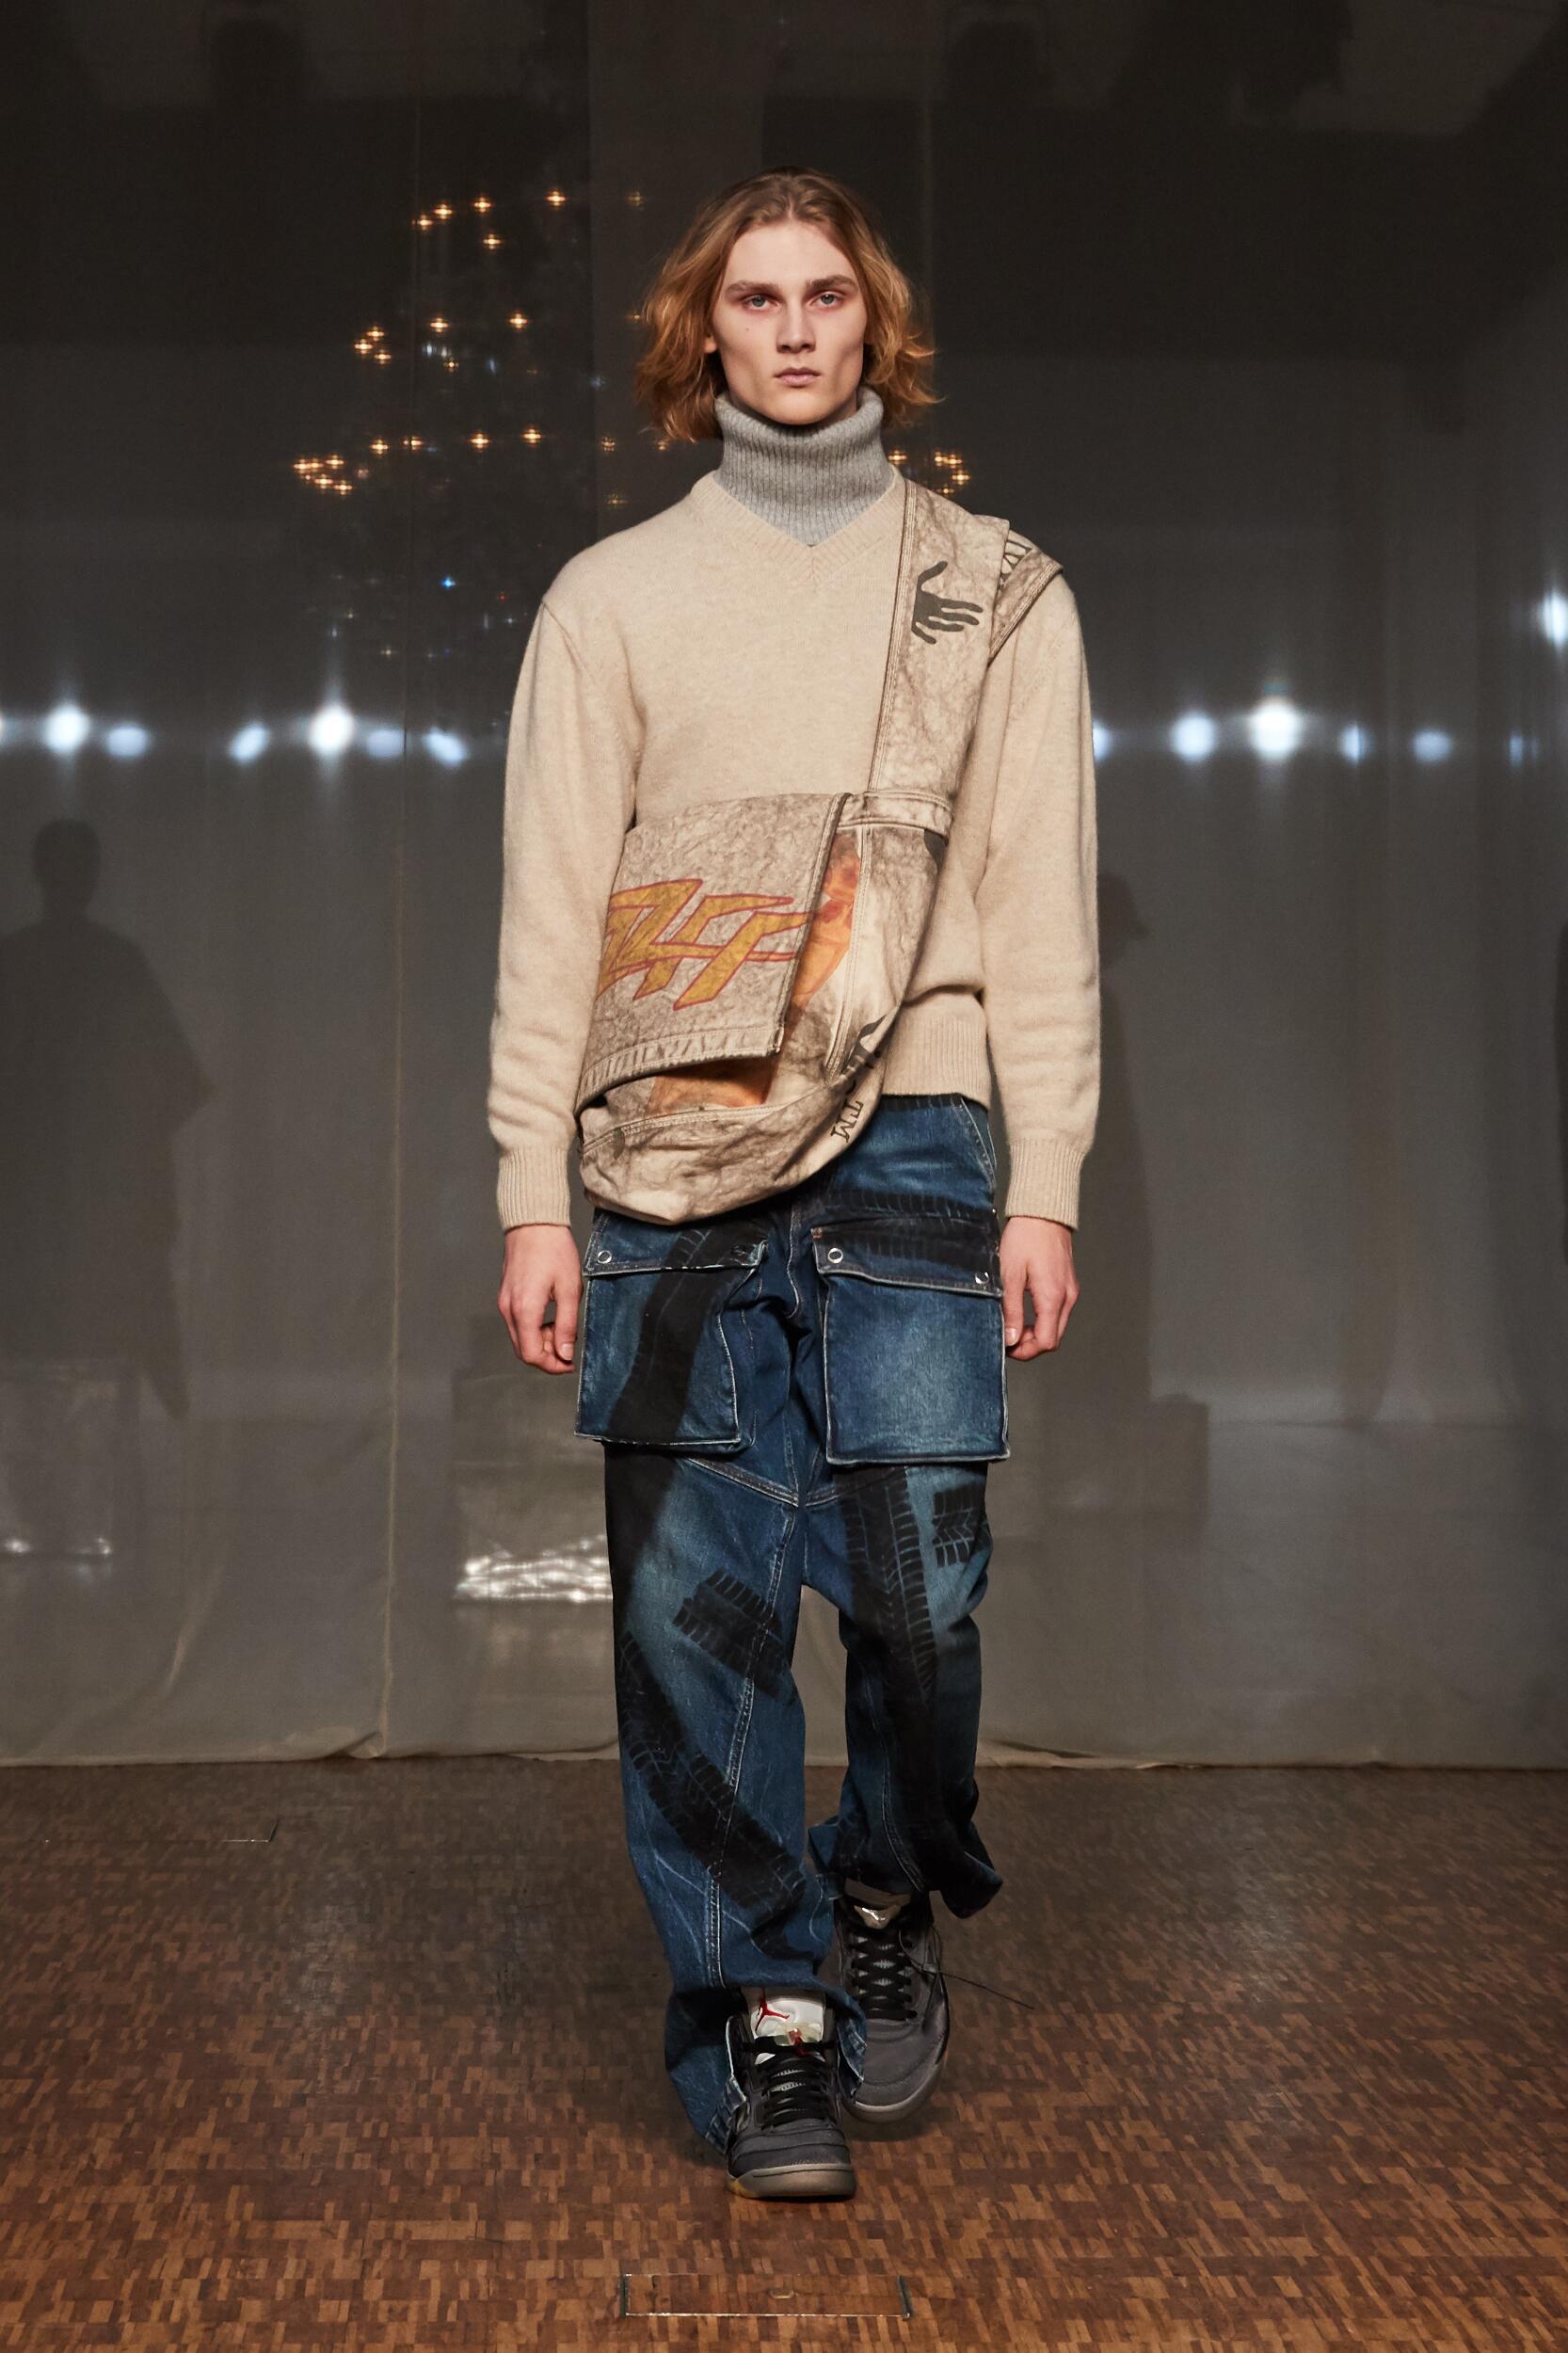 Runway Off White c/o Virgil Abloh Fall Winter 2020 Men's Collection Paris Fashion Week